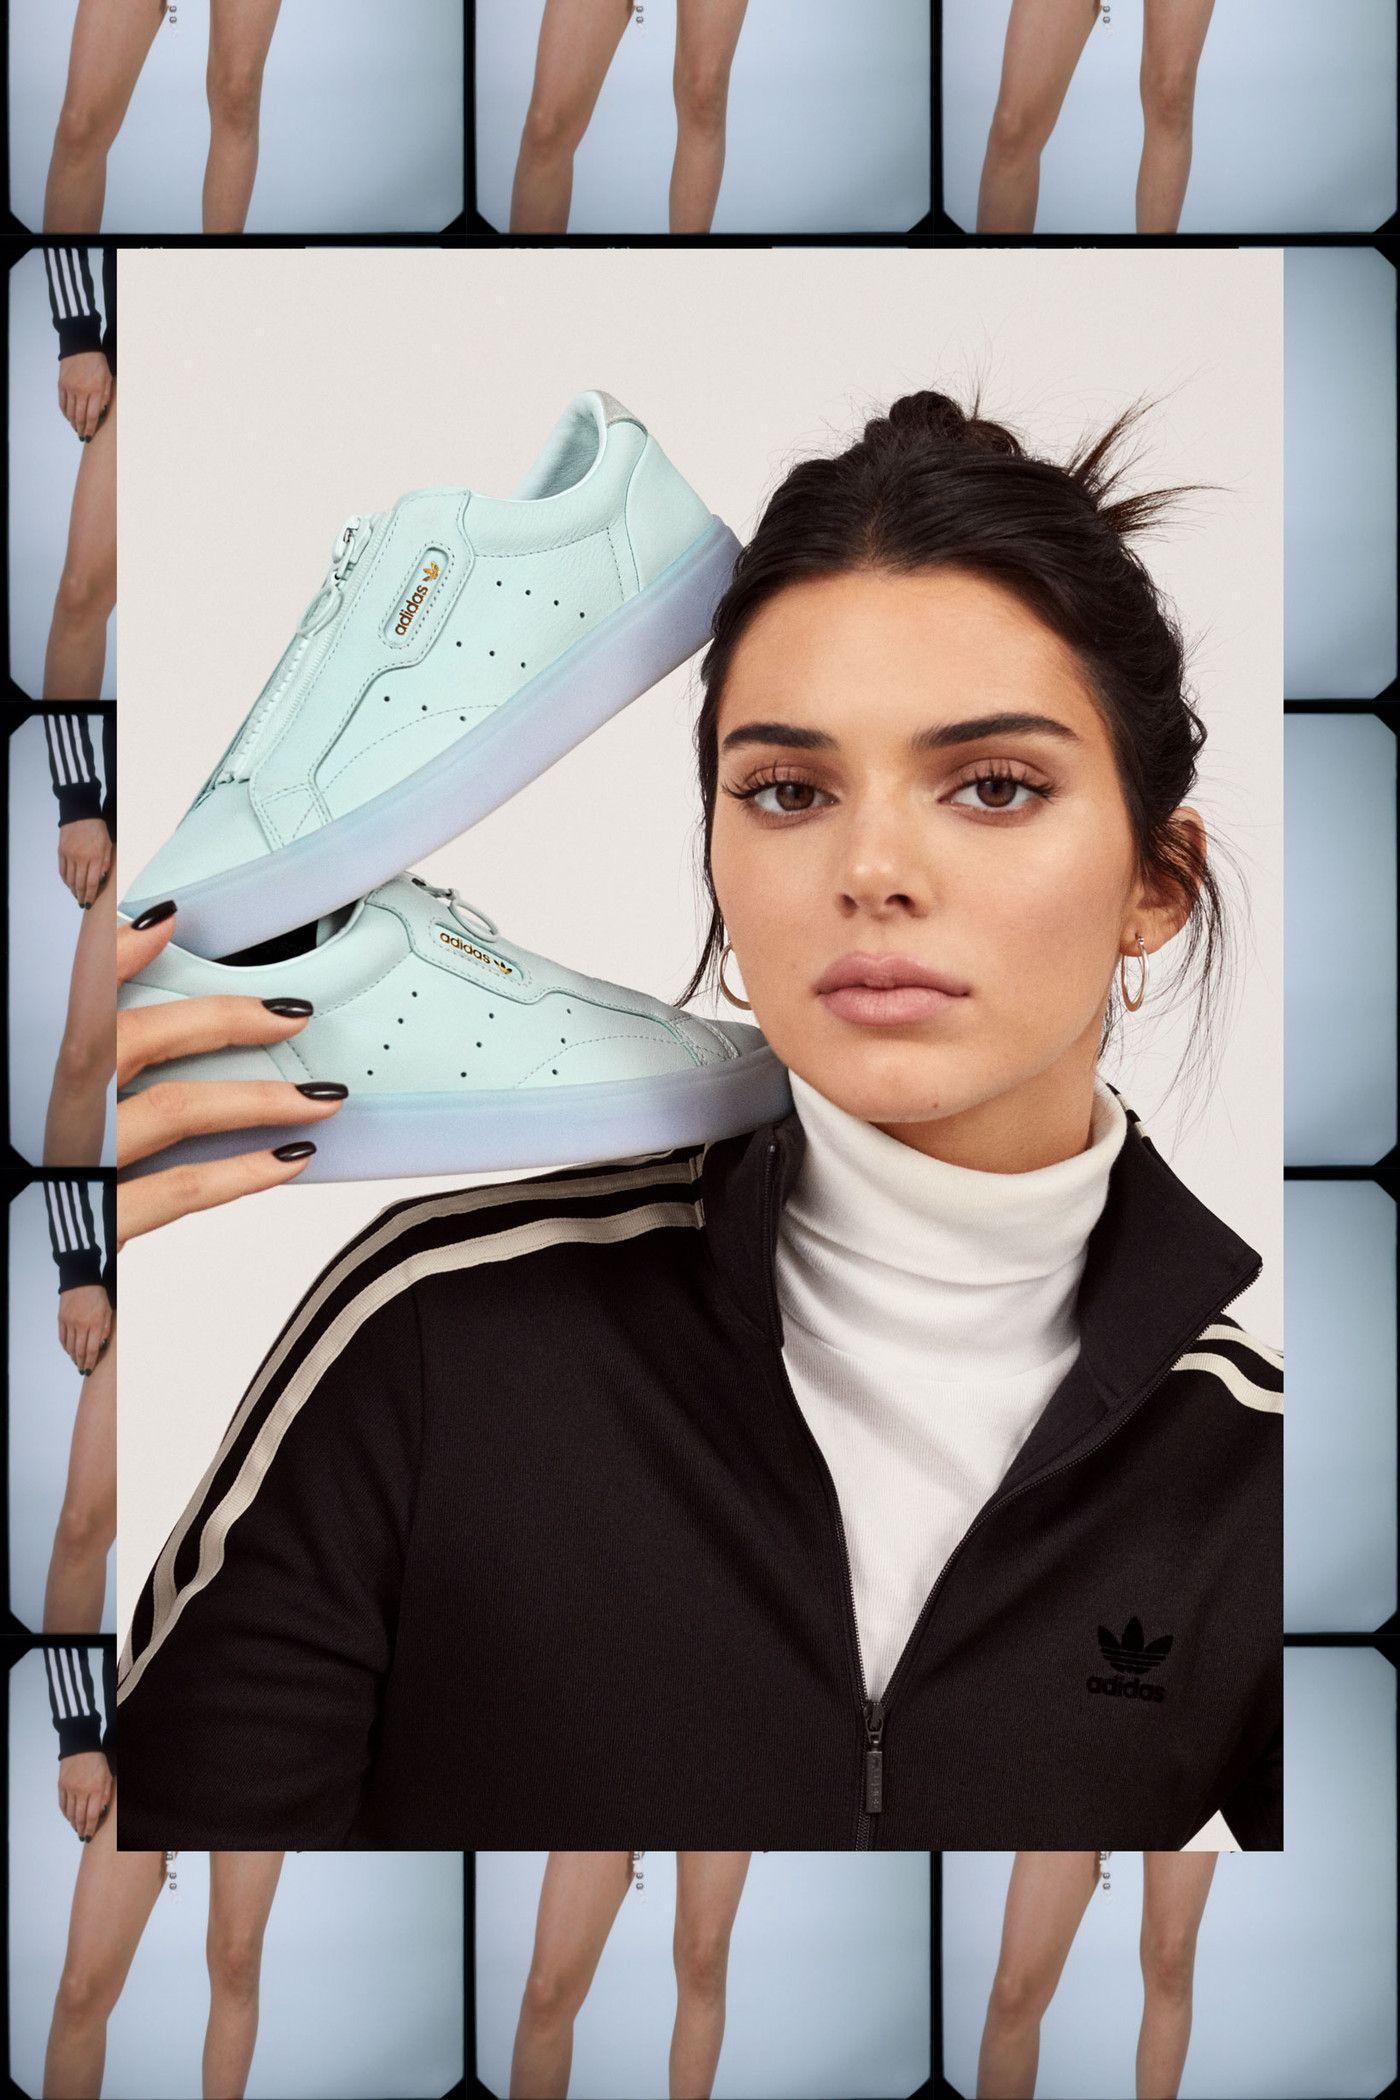 Kendall Jenner Stars in adidas' New Sleek Lookbook in 2019